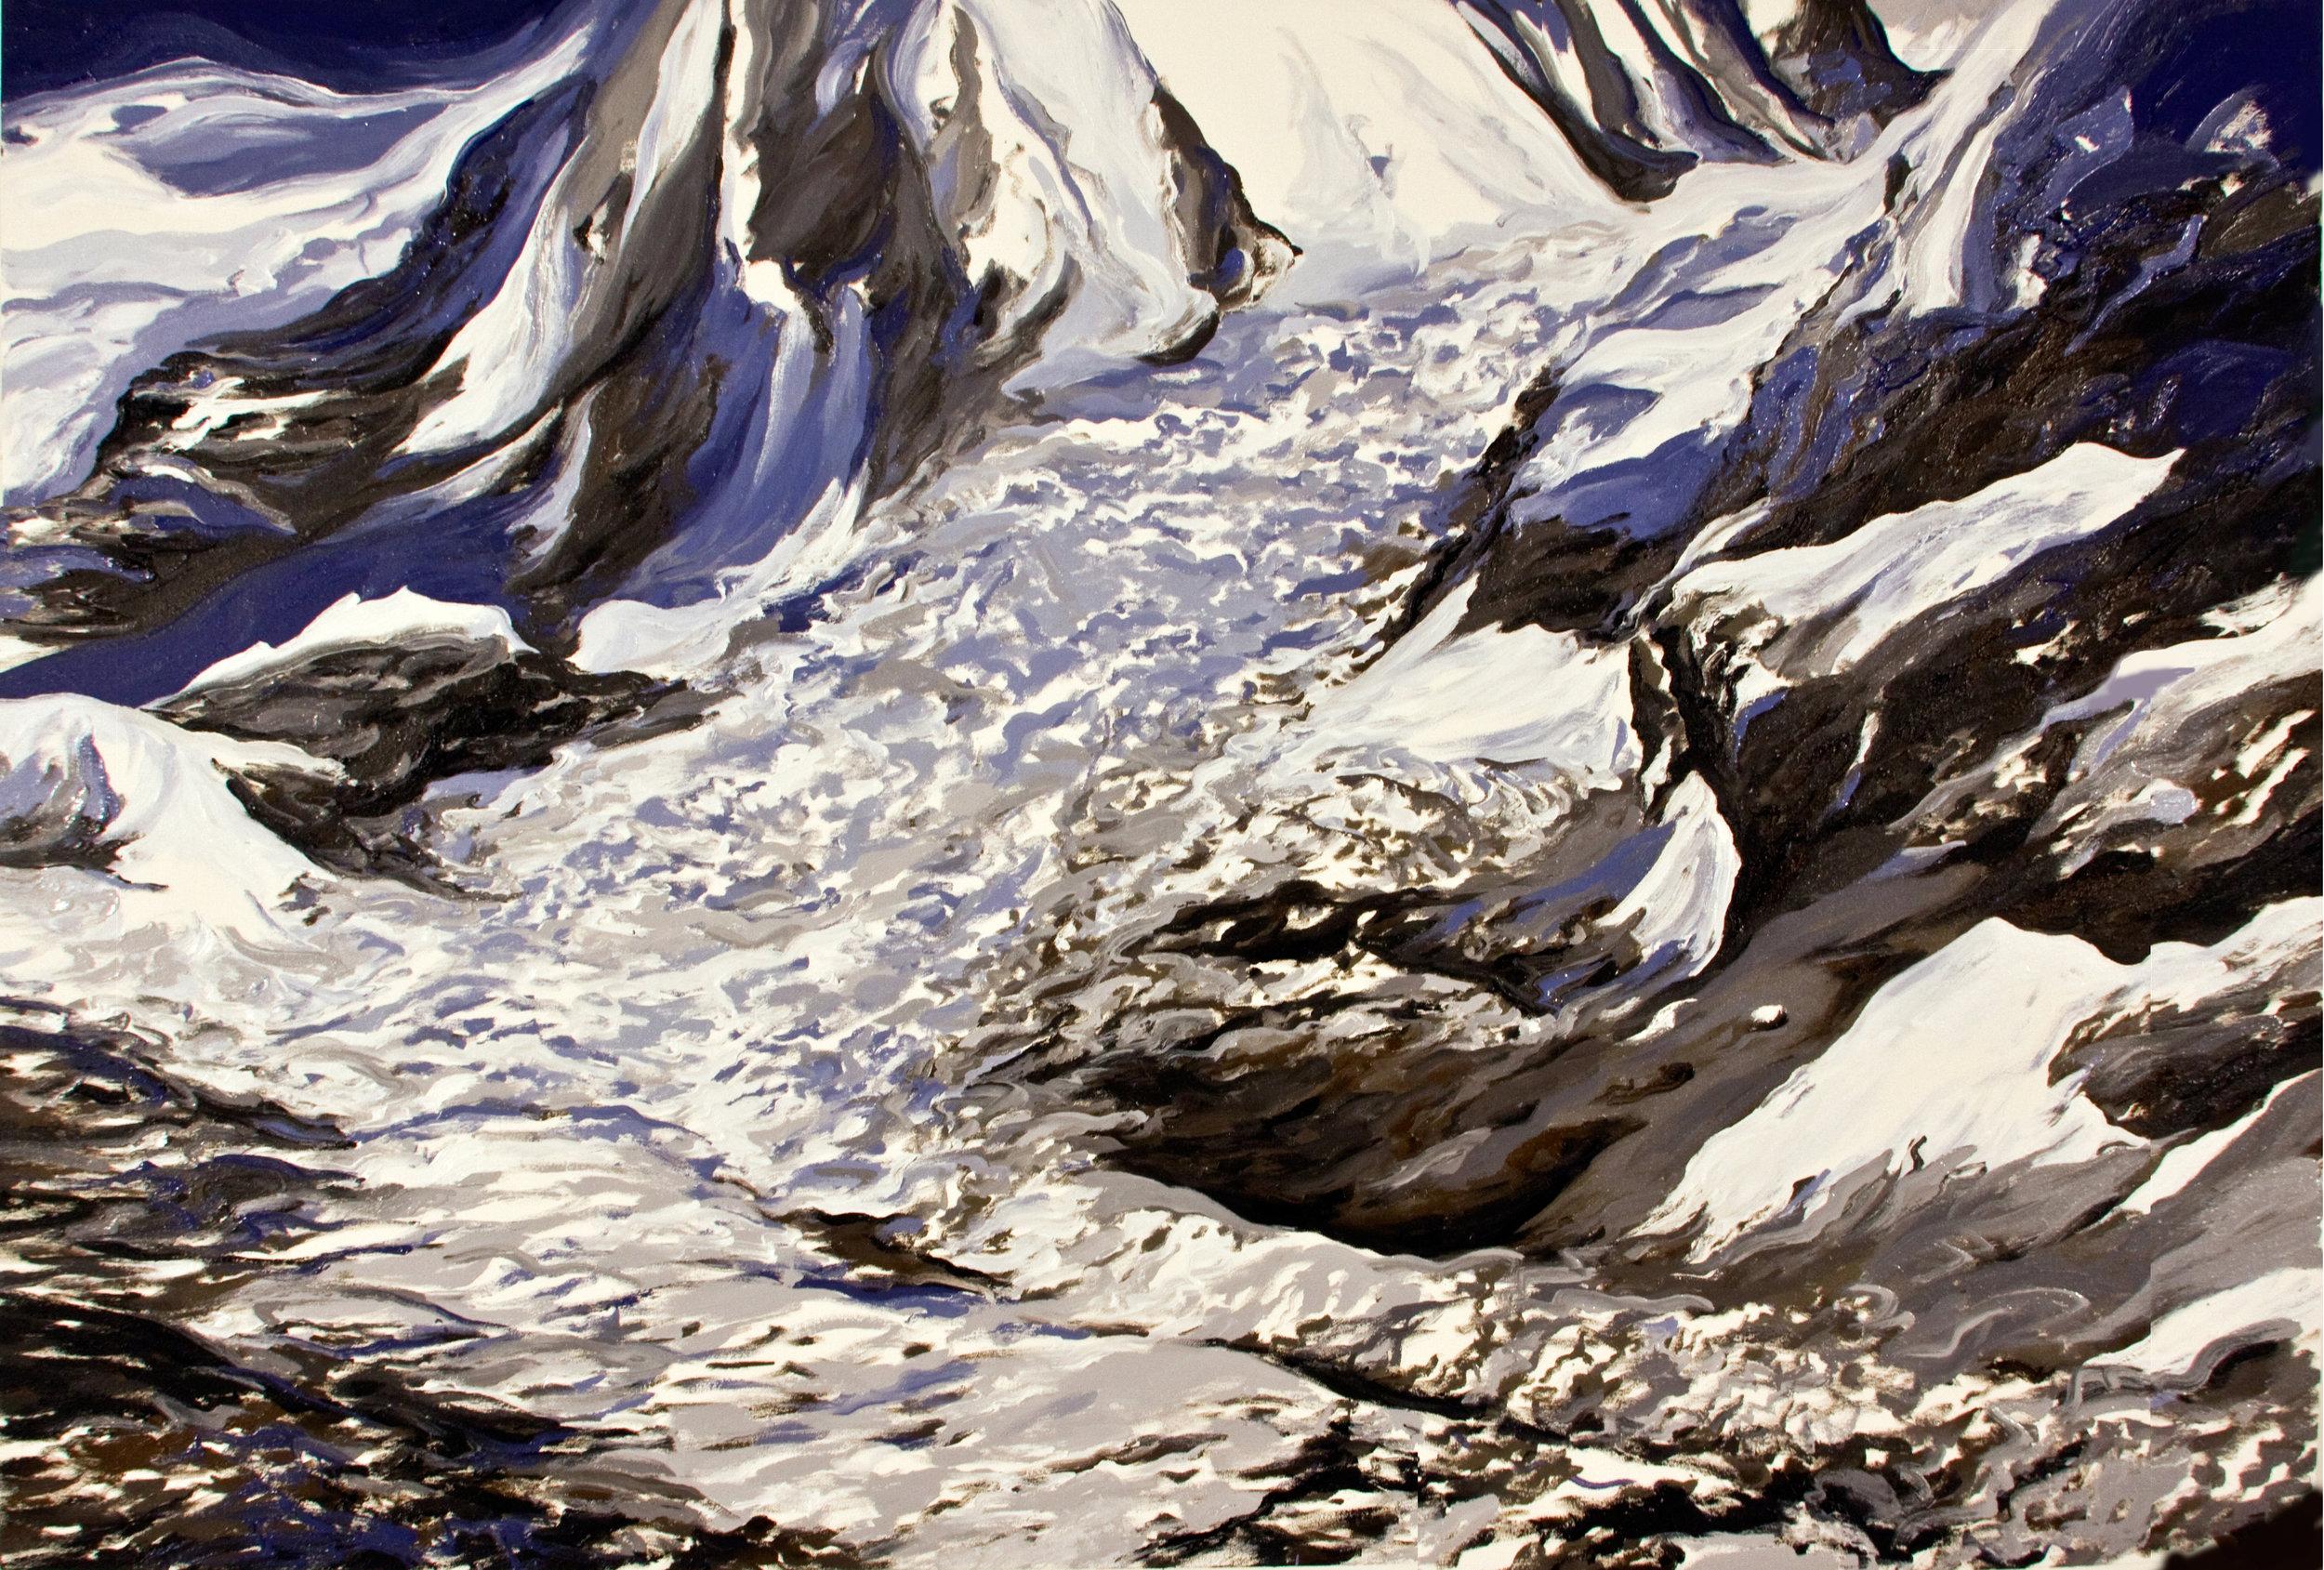 Khumbu Icefall II, 2009, after David Breashears